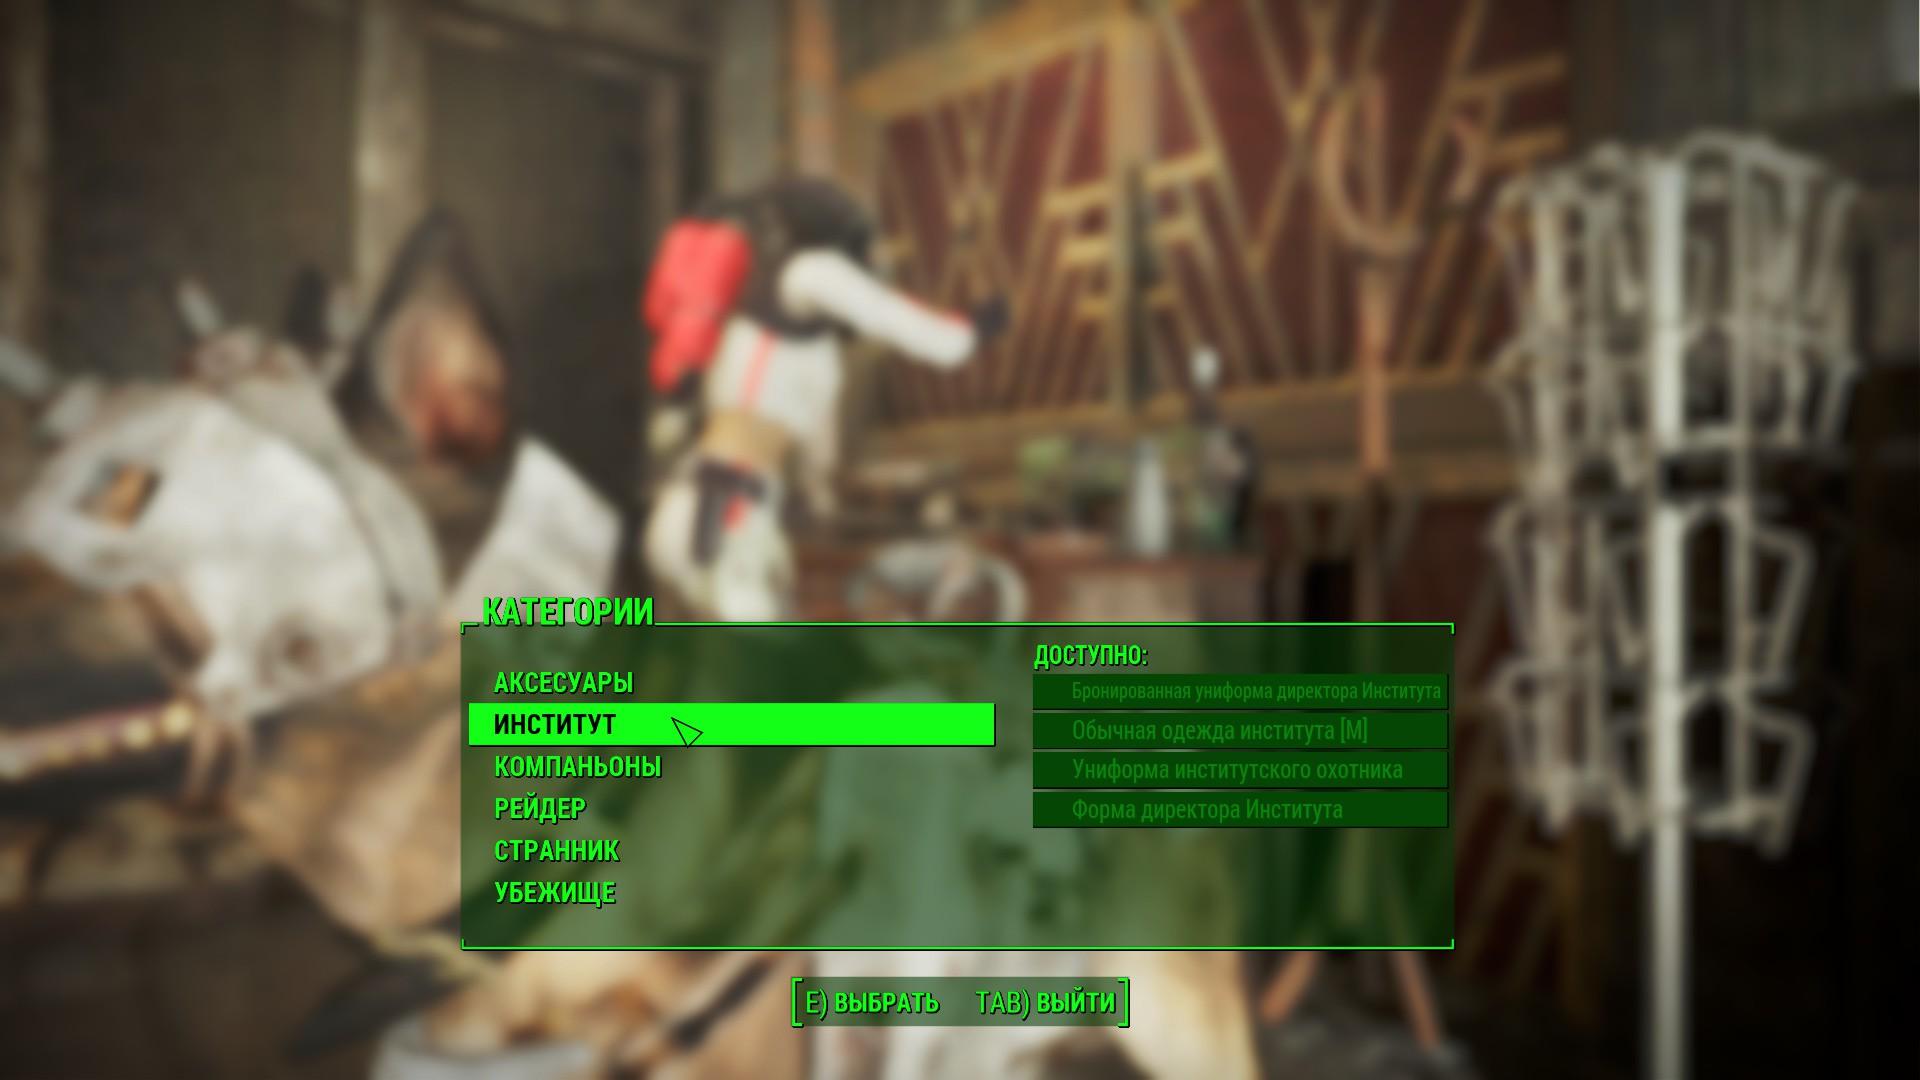 20170930115806_1.jpg - Fallout 4